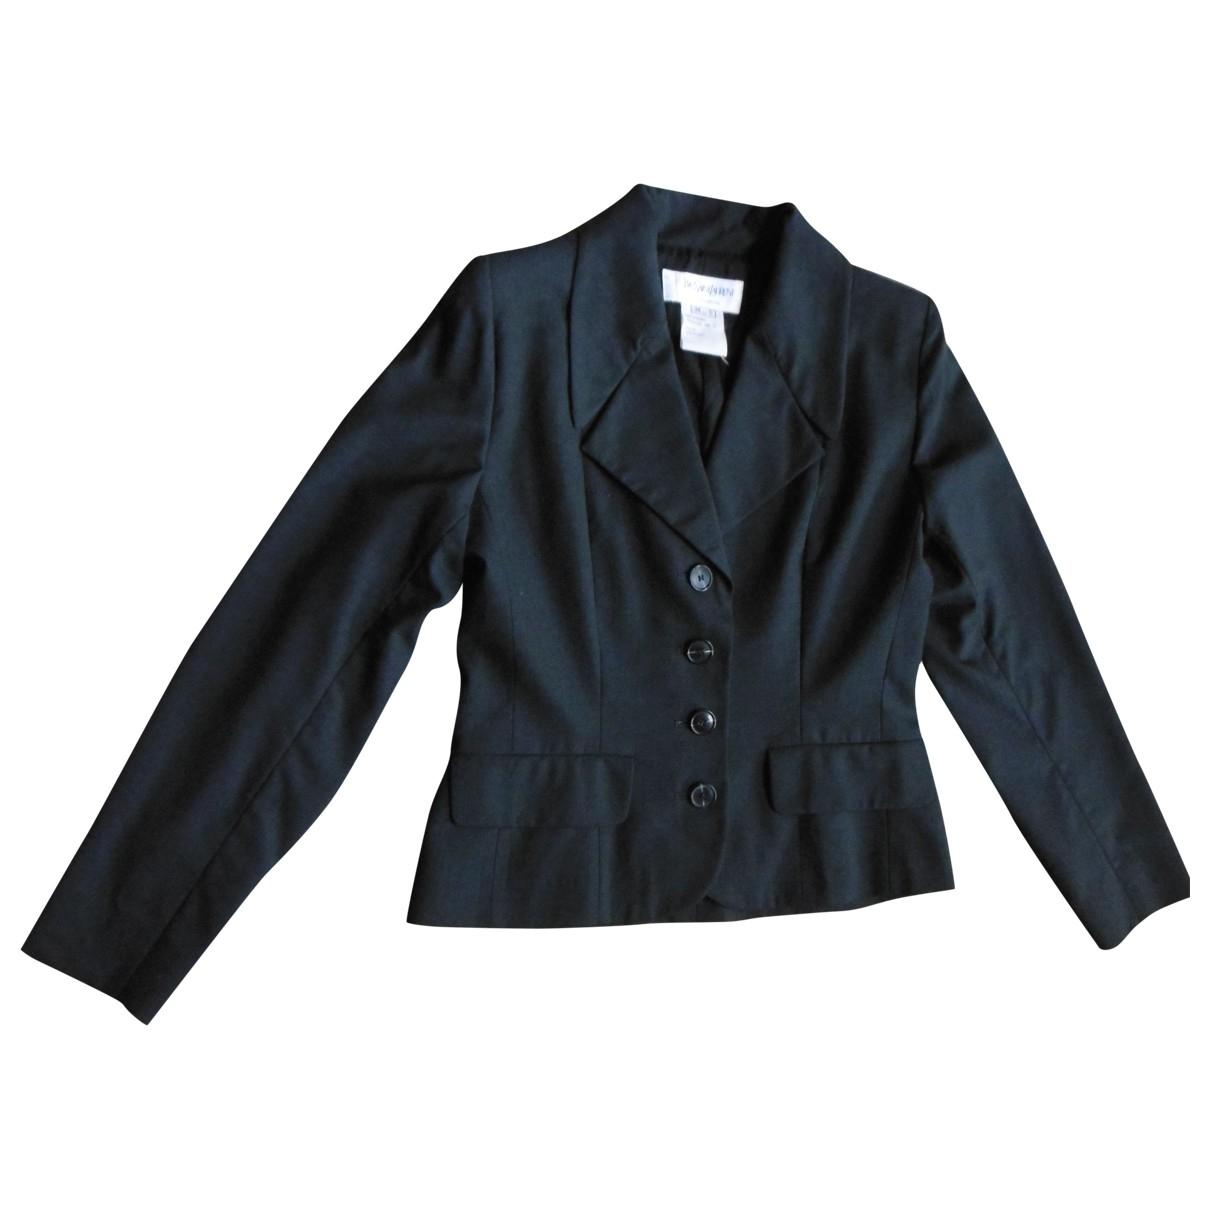 Yves Saint Laurent \N Jacke in  Anthrazit Wolle